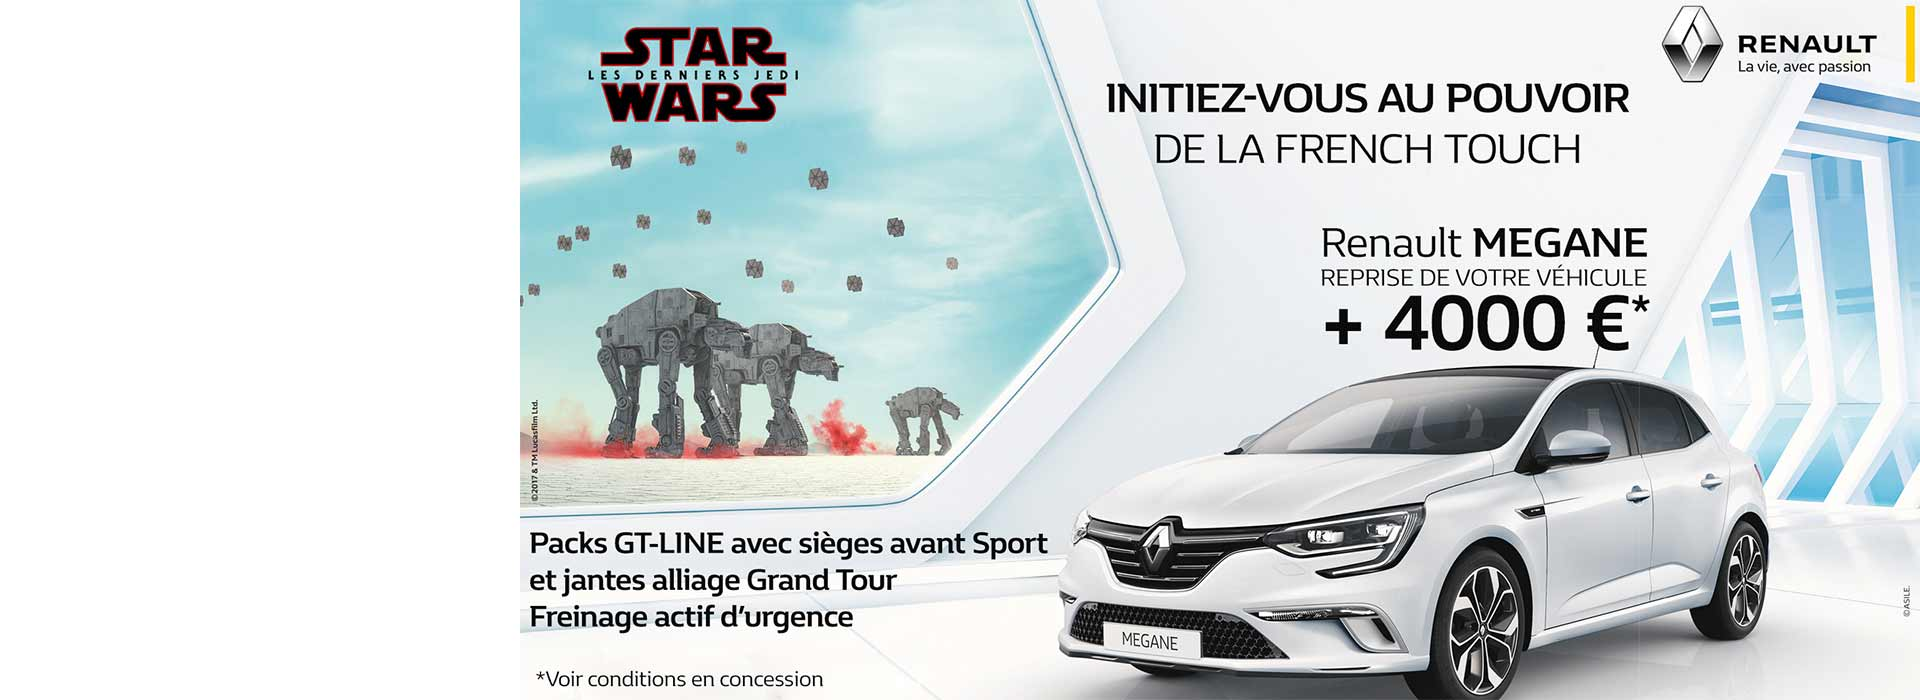 Renault pertuis concessionnaire garage vaucluse 84 for Garage ford vaucluse